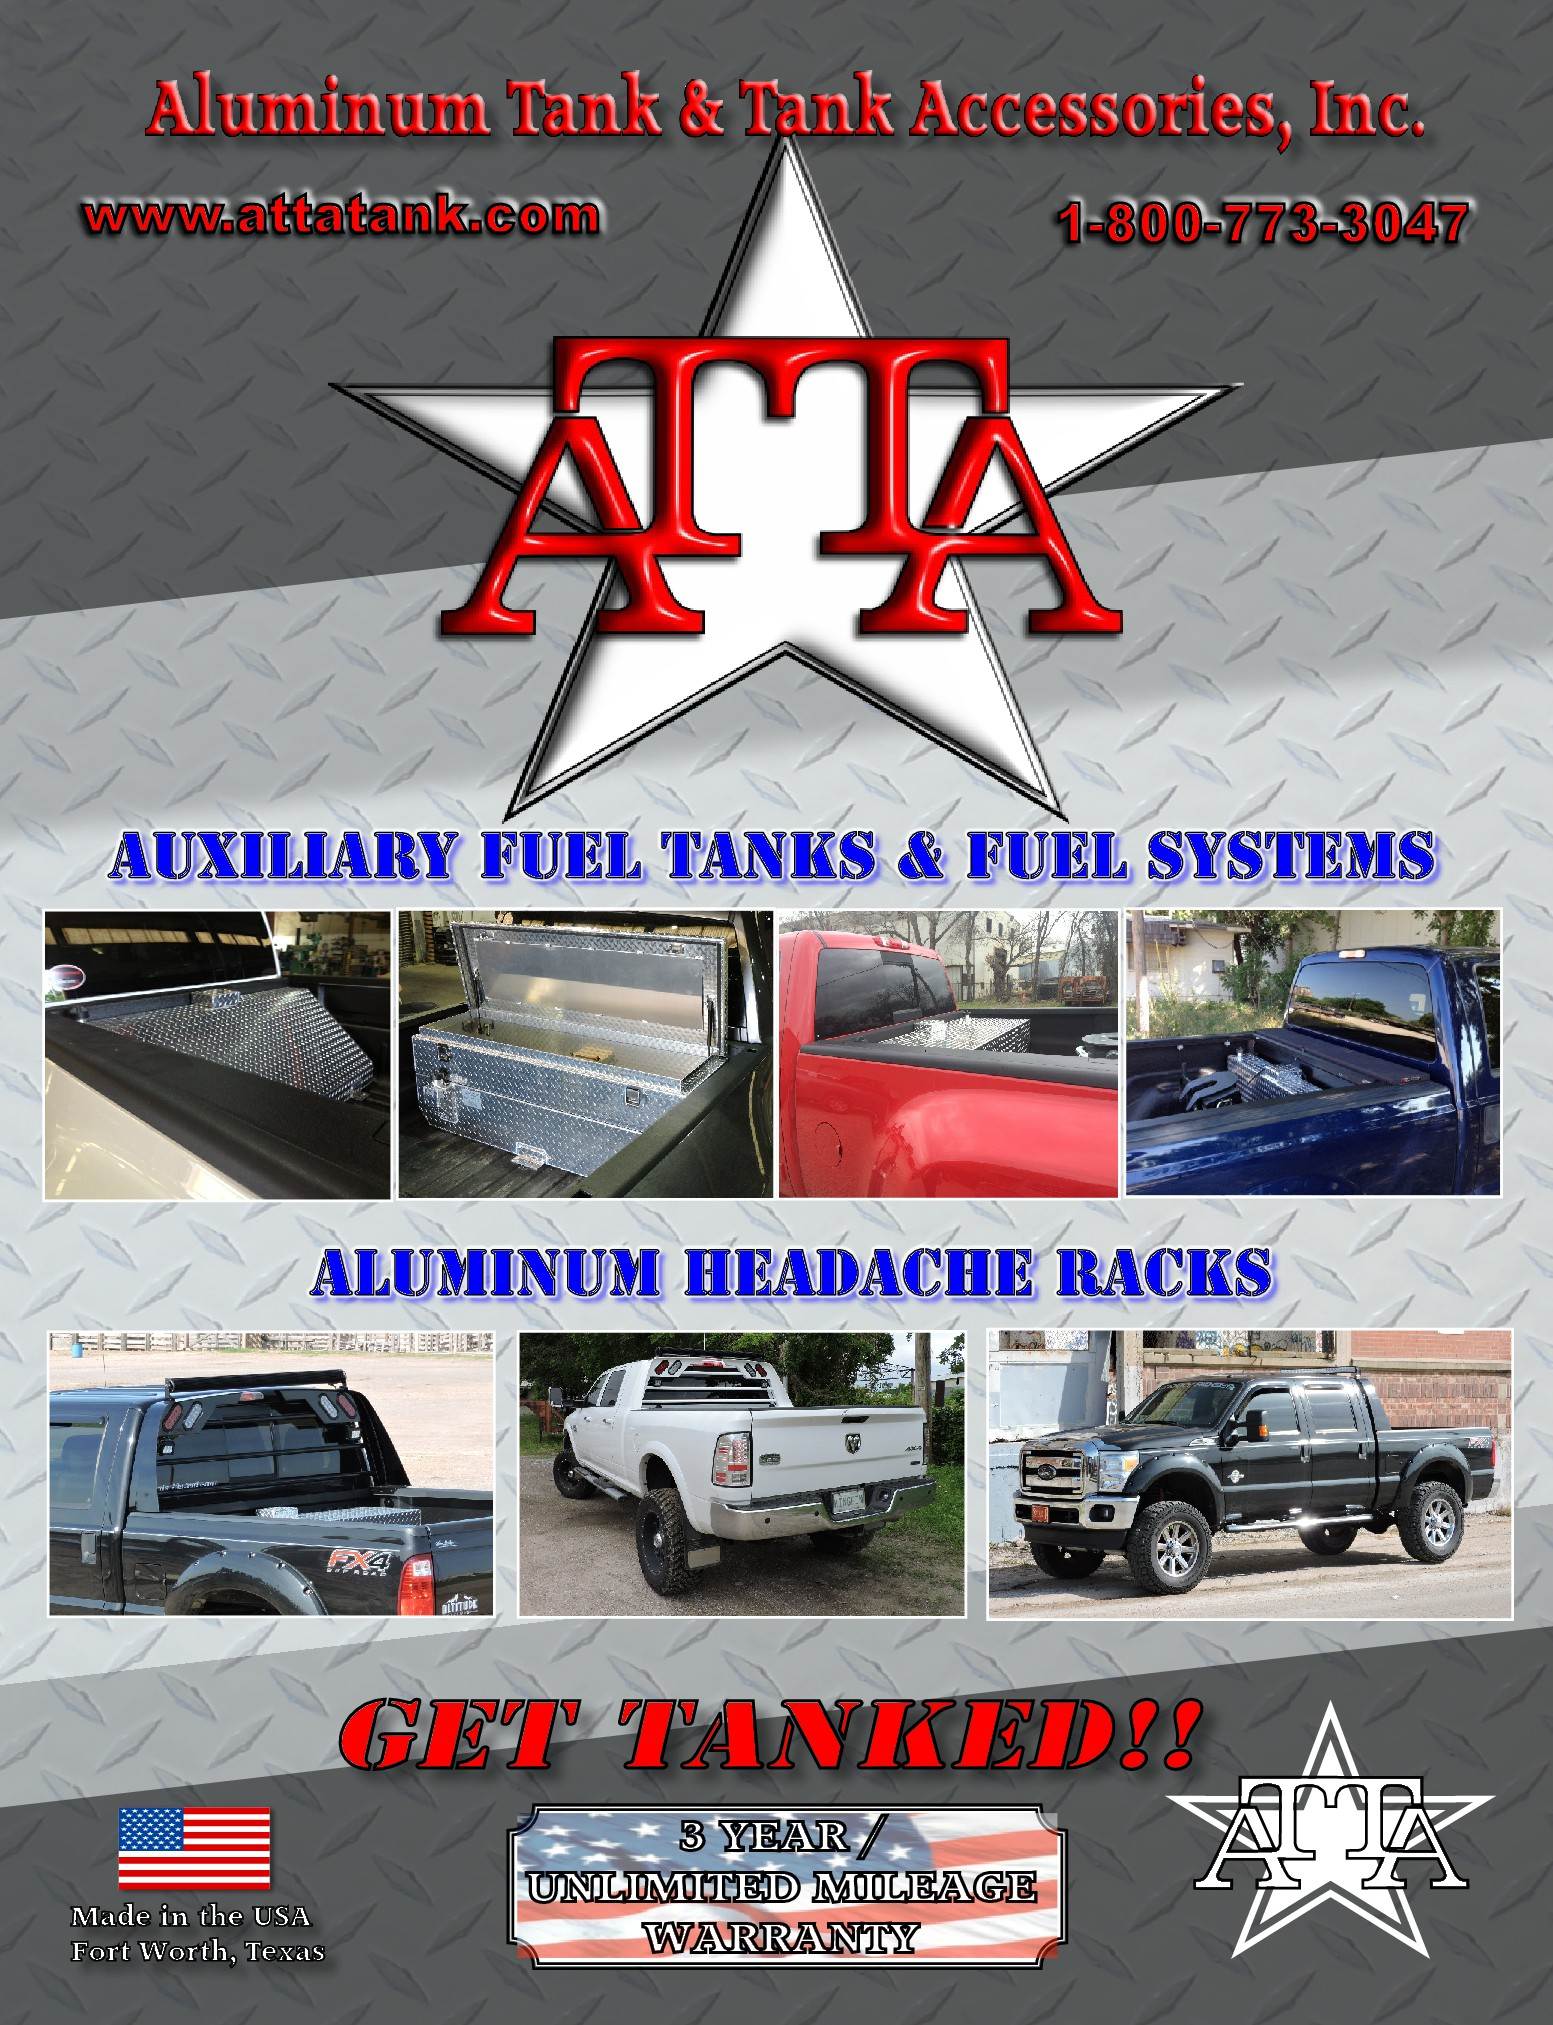 ATTA Catalog Cover